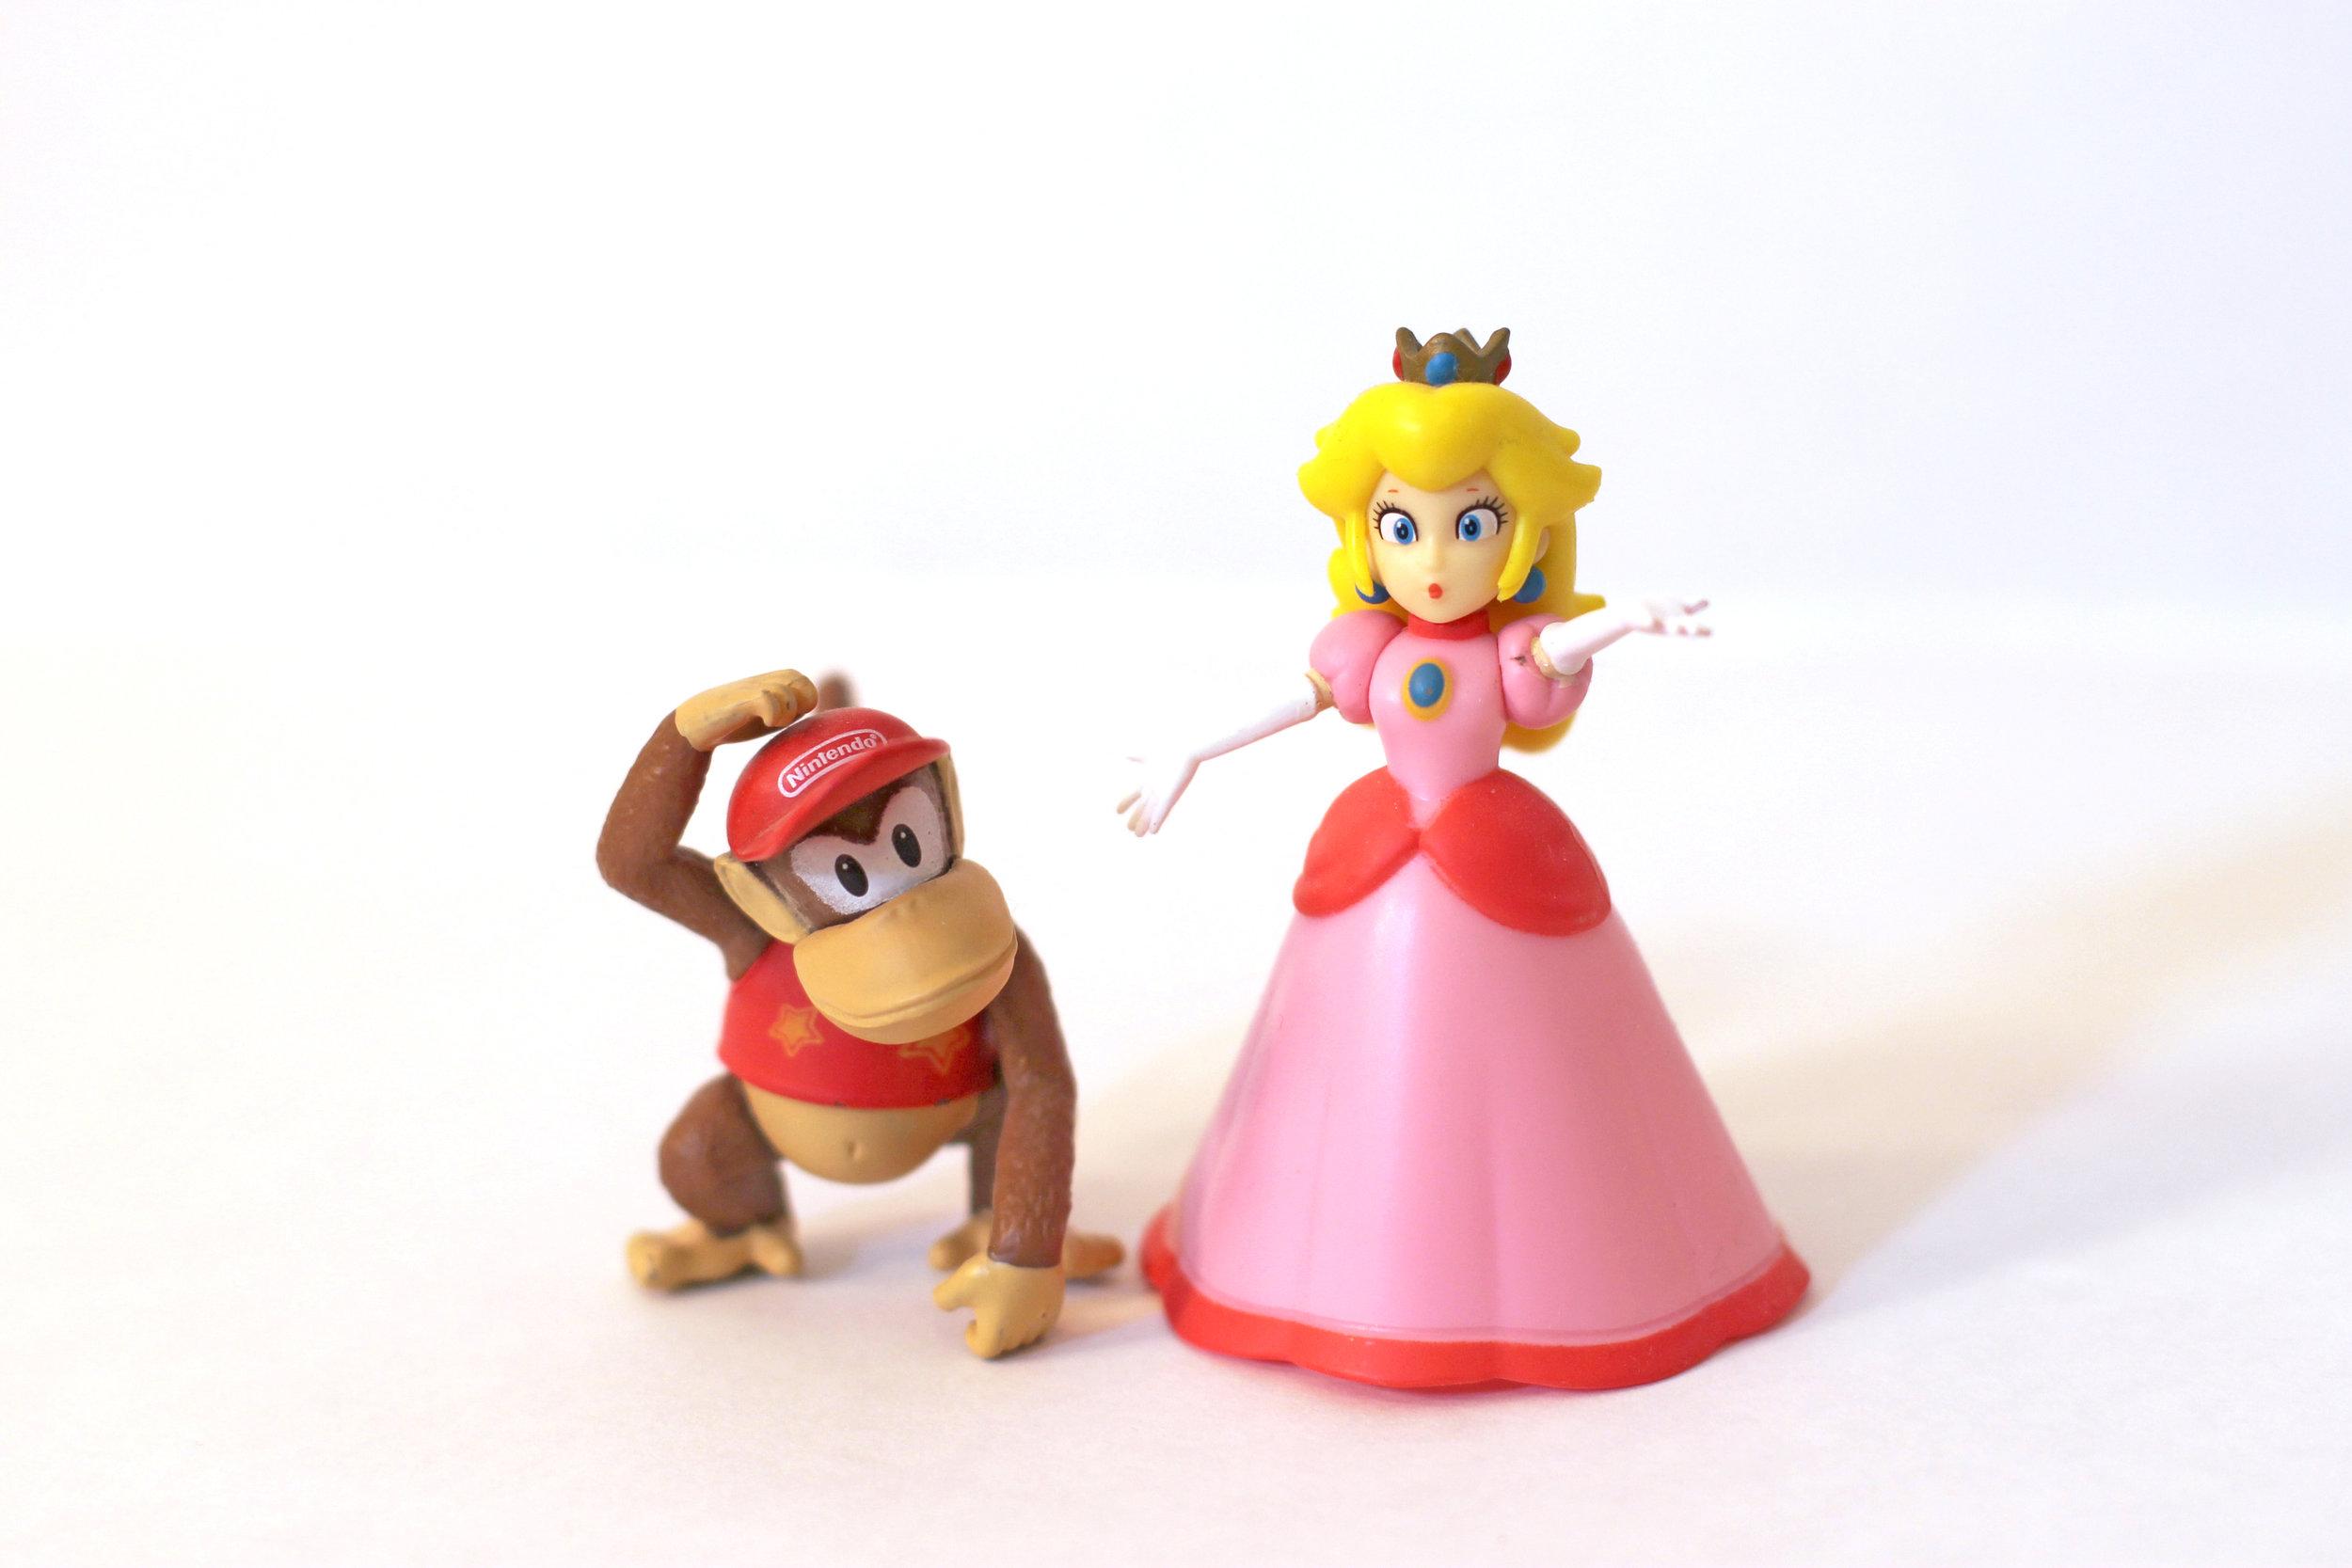 Princess Peach and Diddy Kong